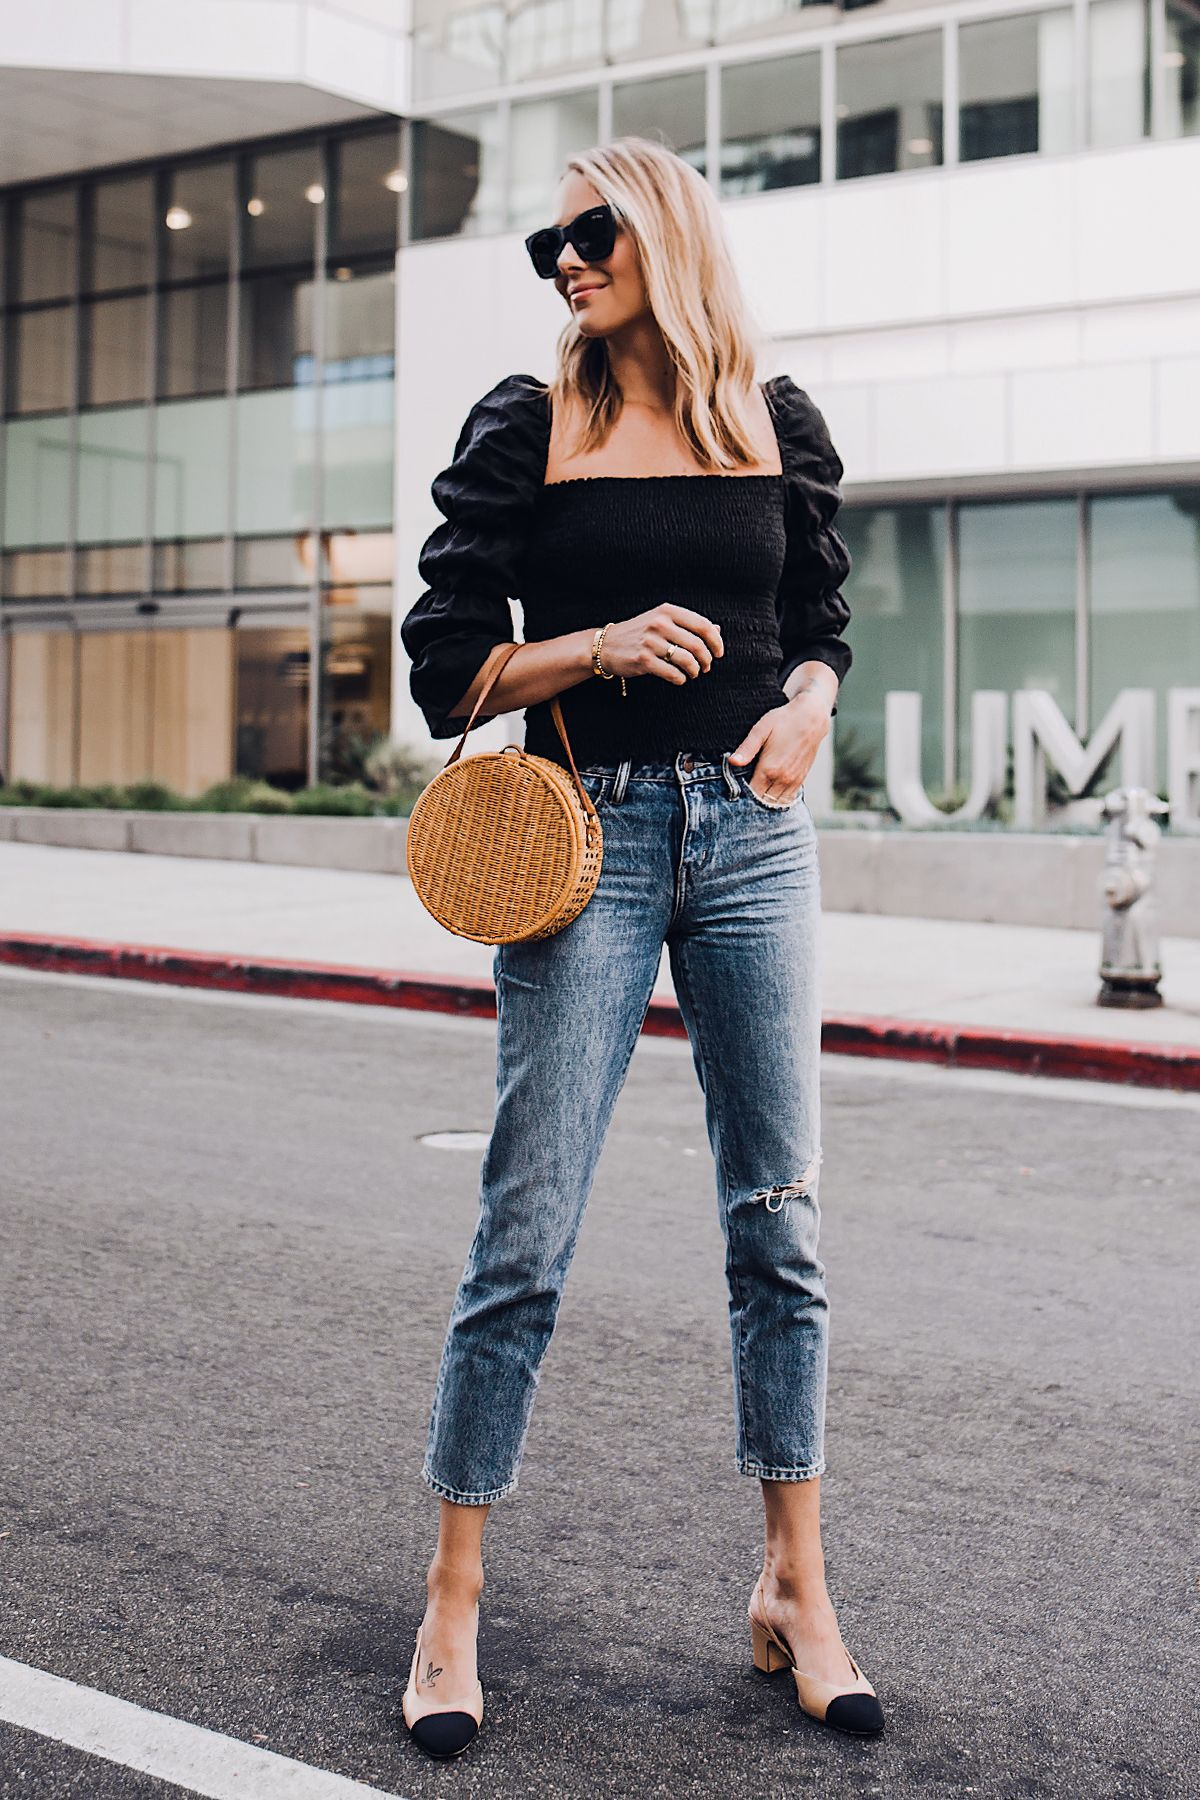 938b50f2afc3 Blonde Woman Wearing Fashion Jackson Reformation Gala Top Black Straight  Leg Ripped Jeans Chanel Slingback Shoes Cane Circle Straw Handbag Black  Sunglasses ...